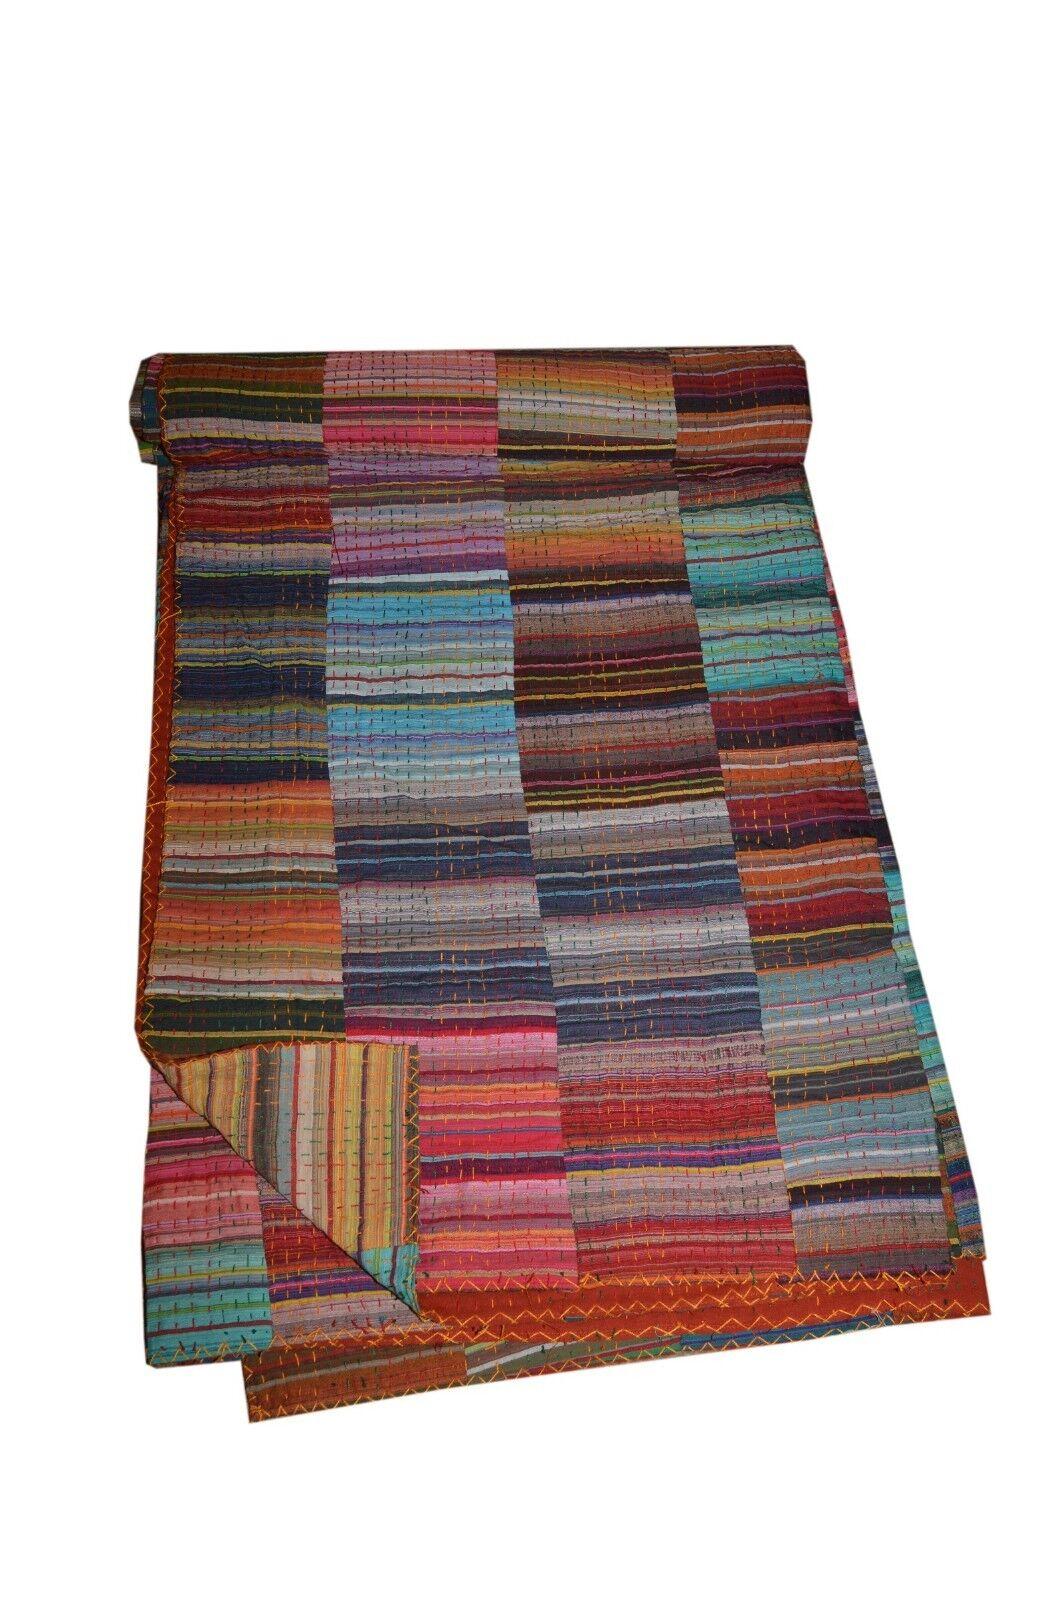 Kantha Multi Stripe Patch Handmade Bedspread Throw Cotton Gudari Ethnic Blanket